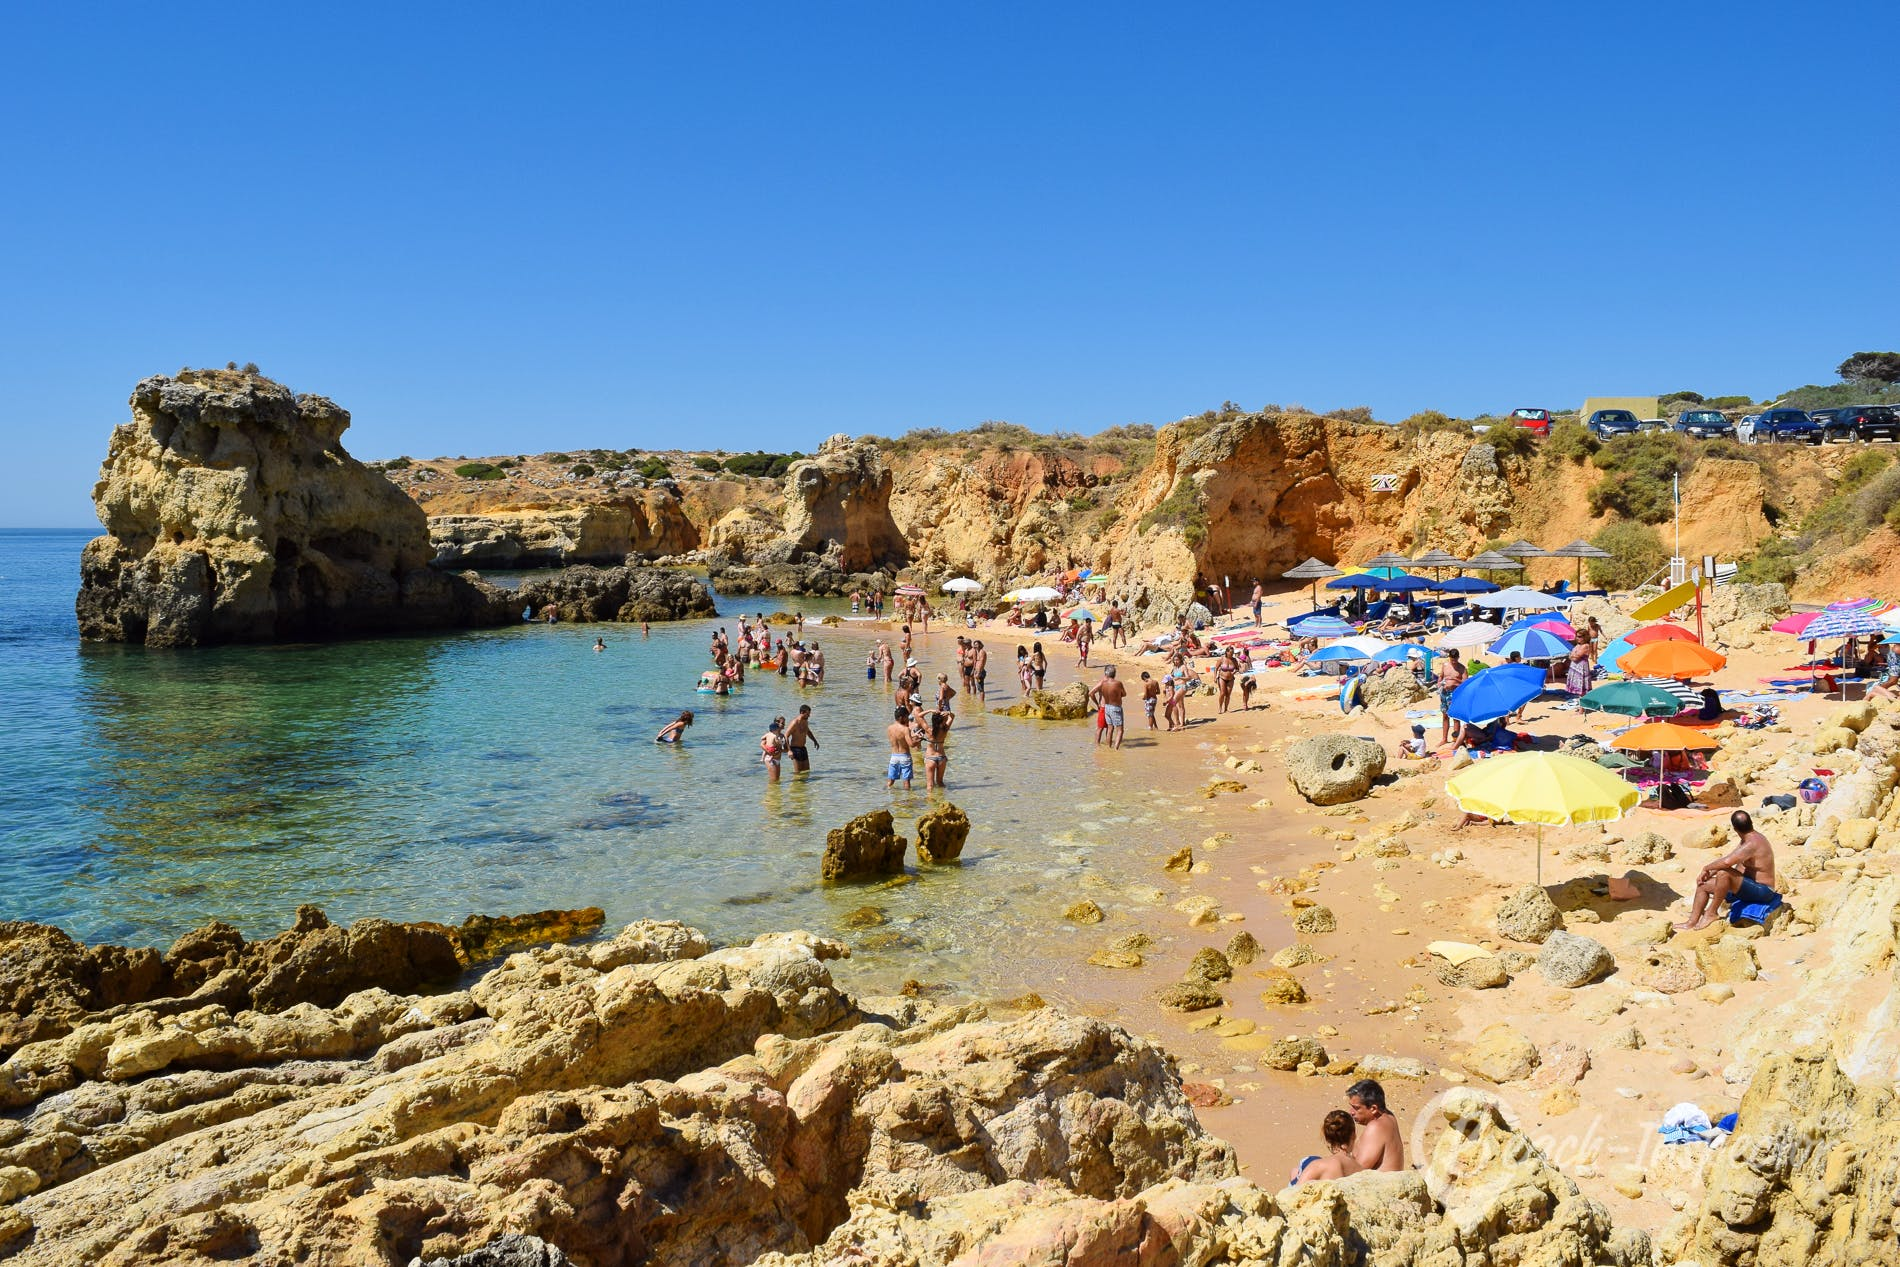 Beach Praia de Arrifes, Algarve, Portugal